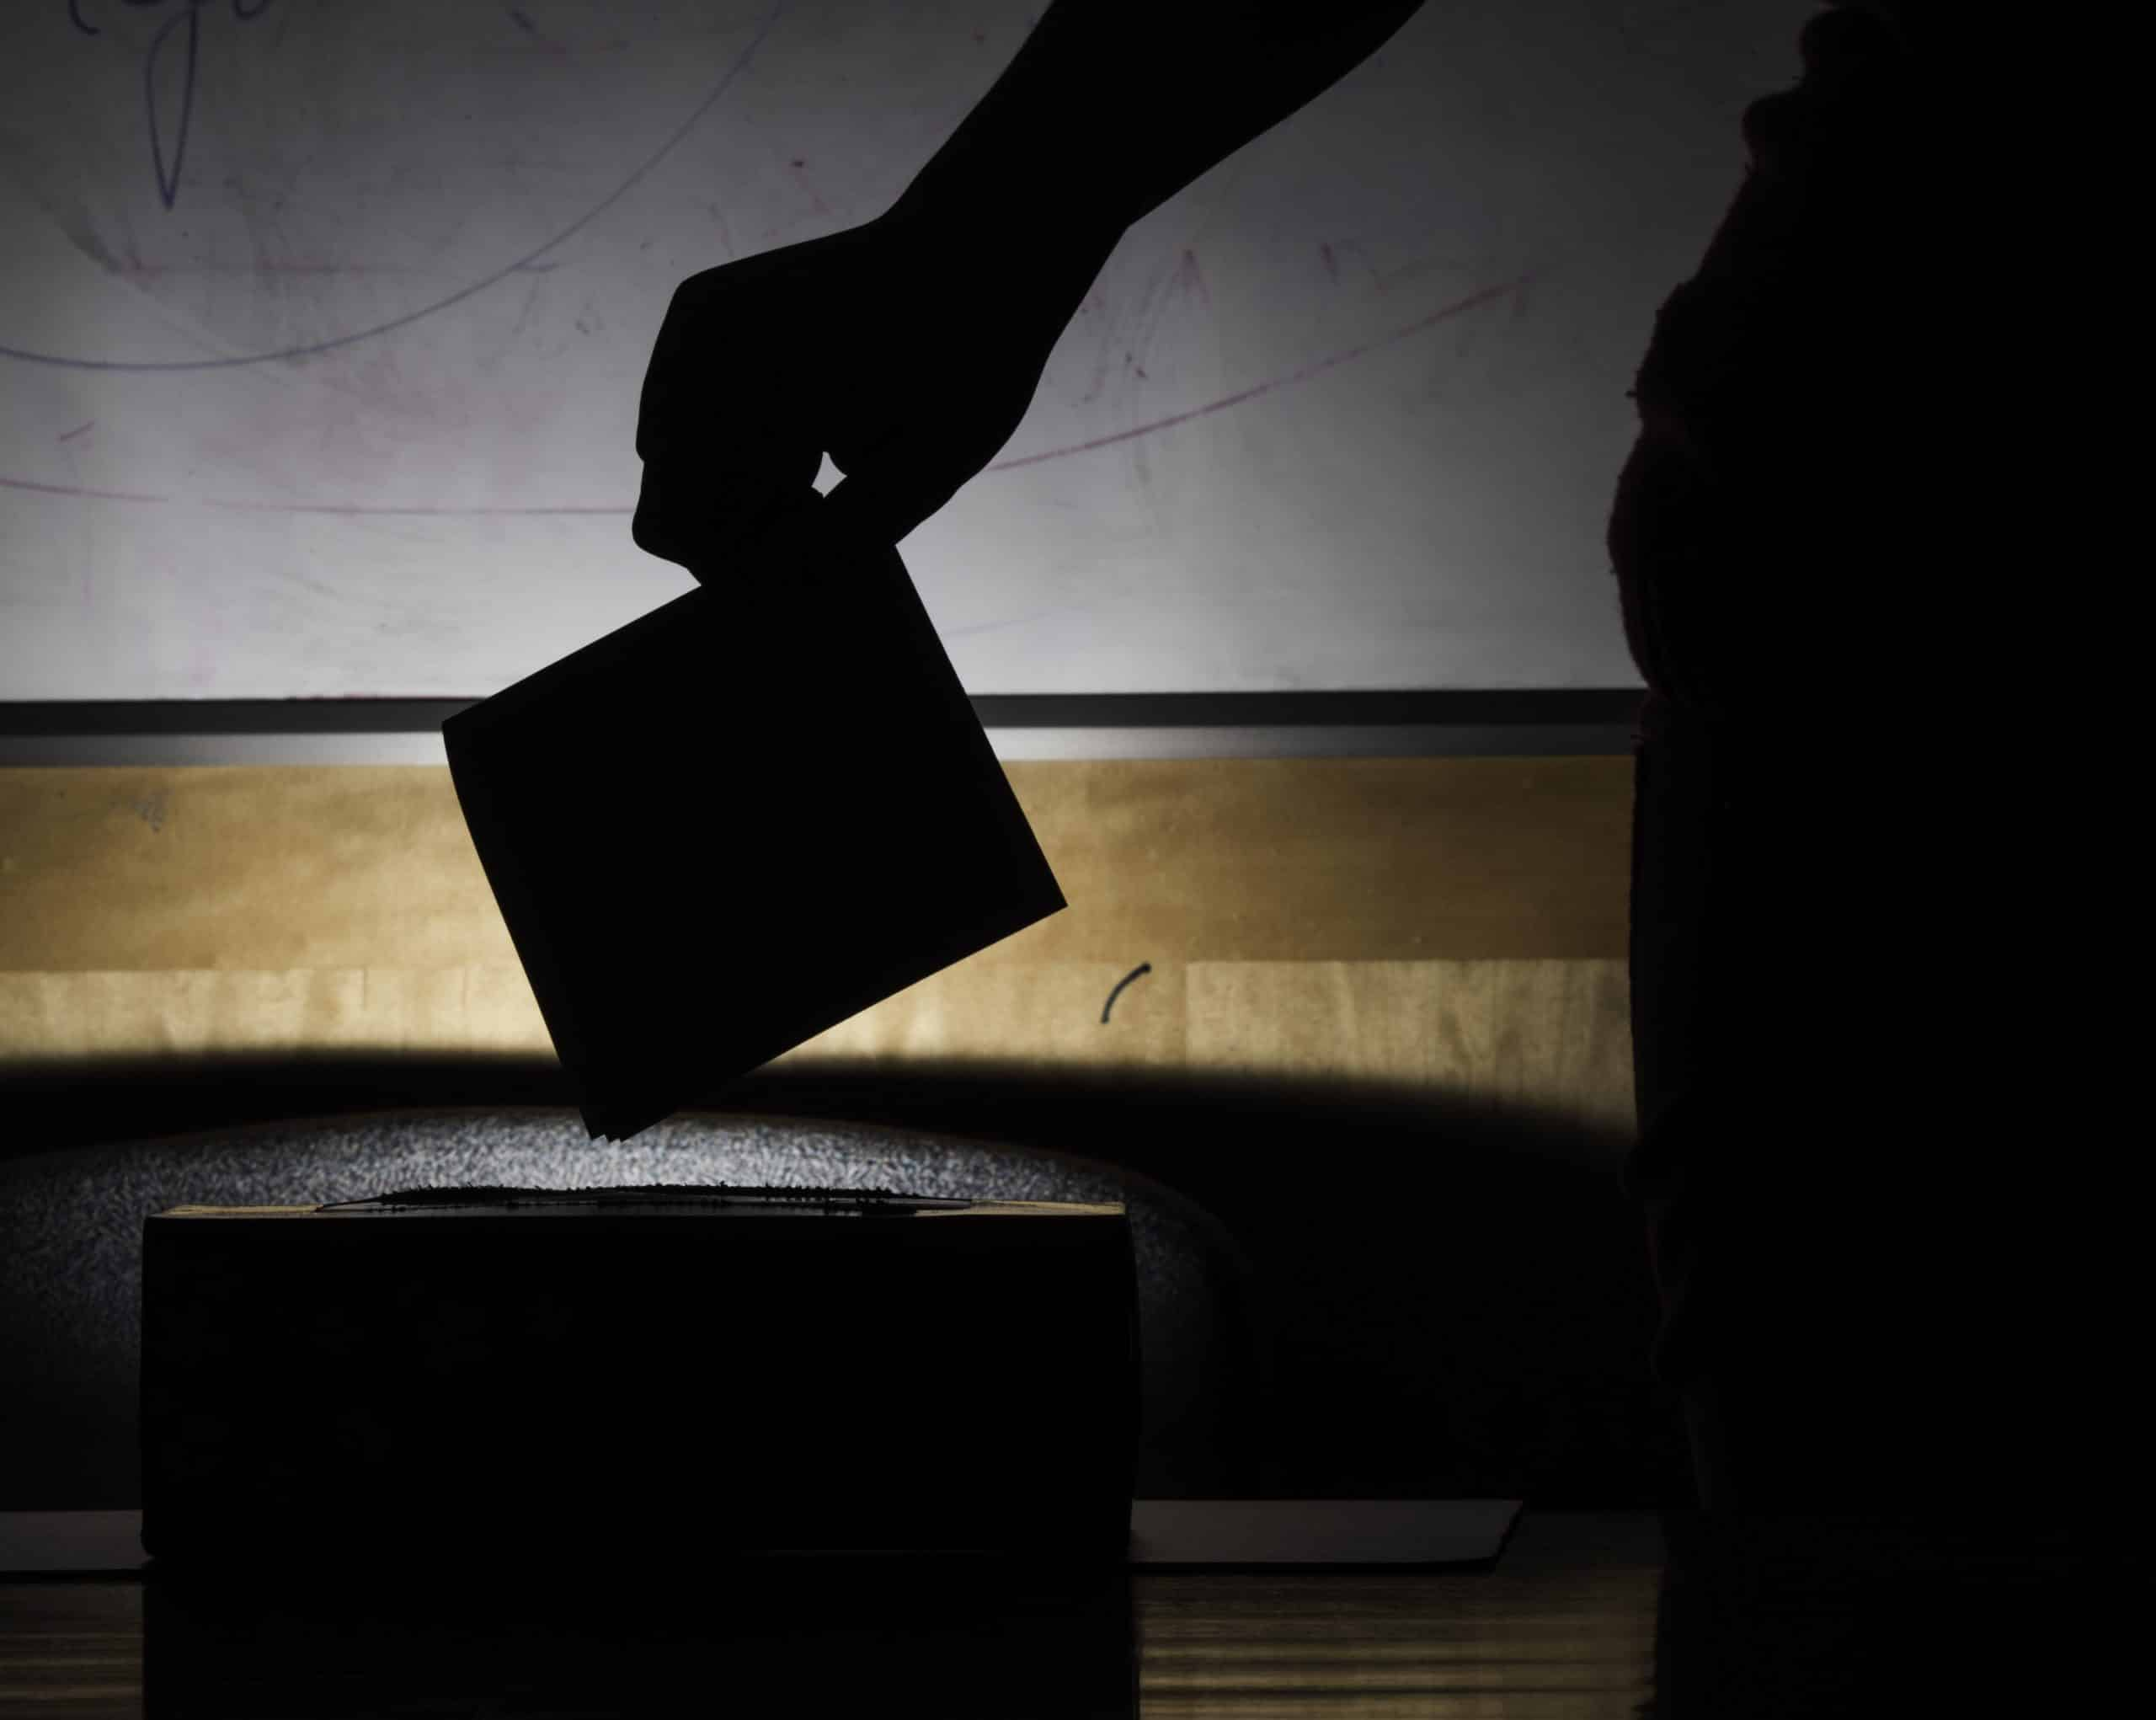 Democrats Sue To Block AZ Election Audit. 1